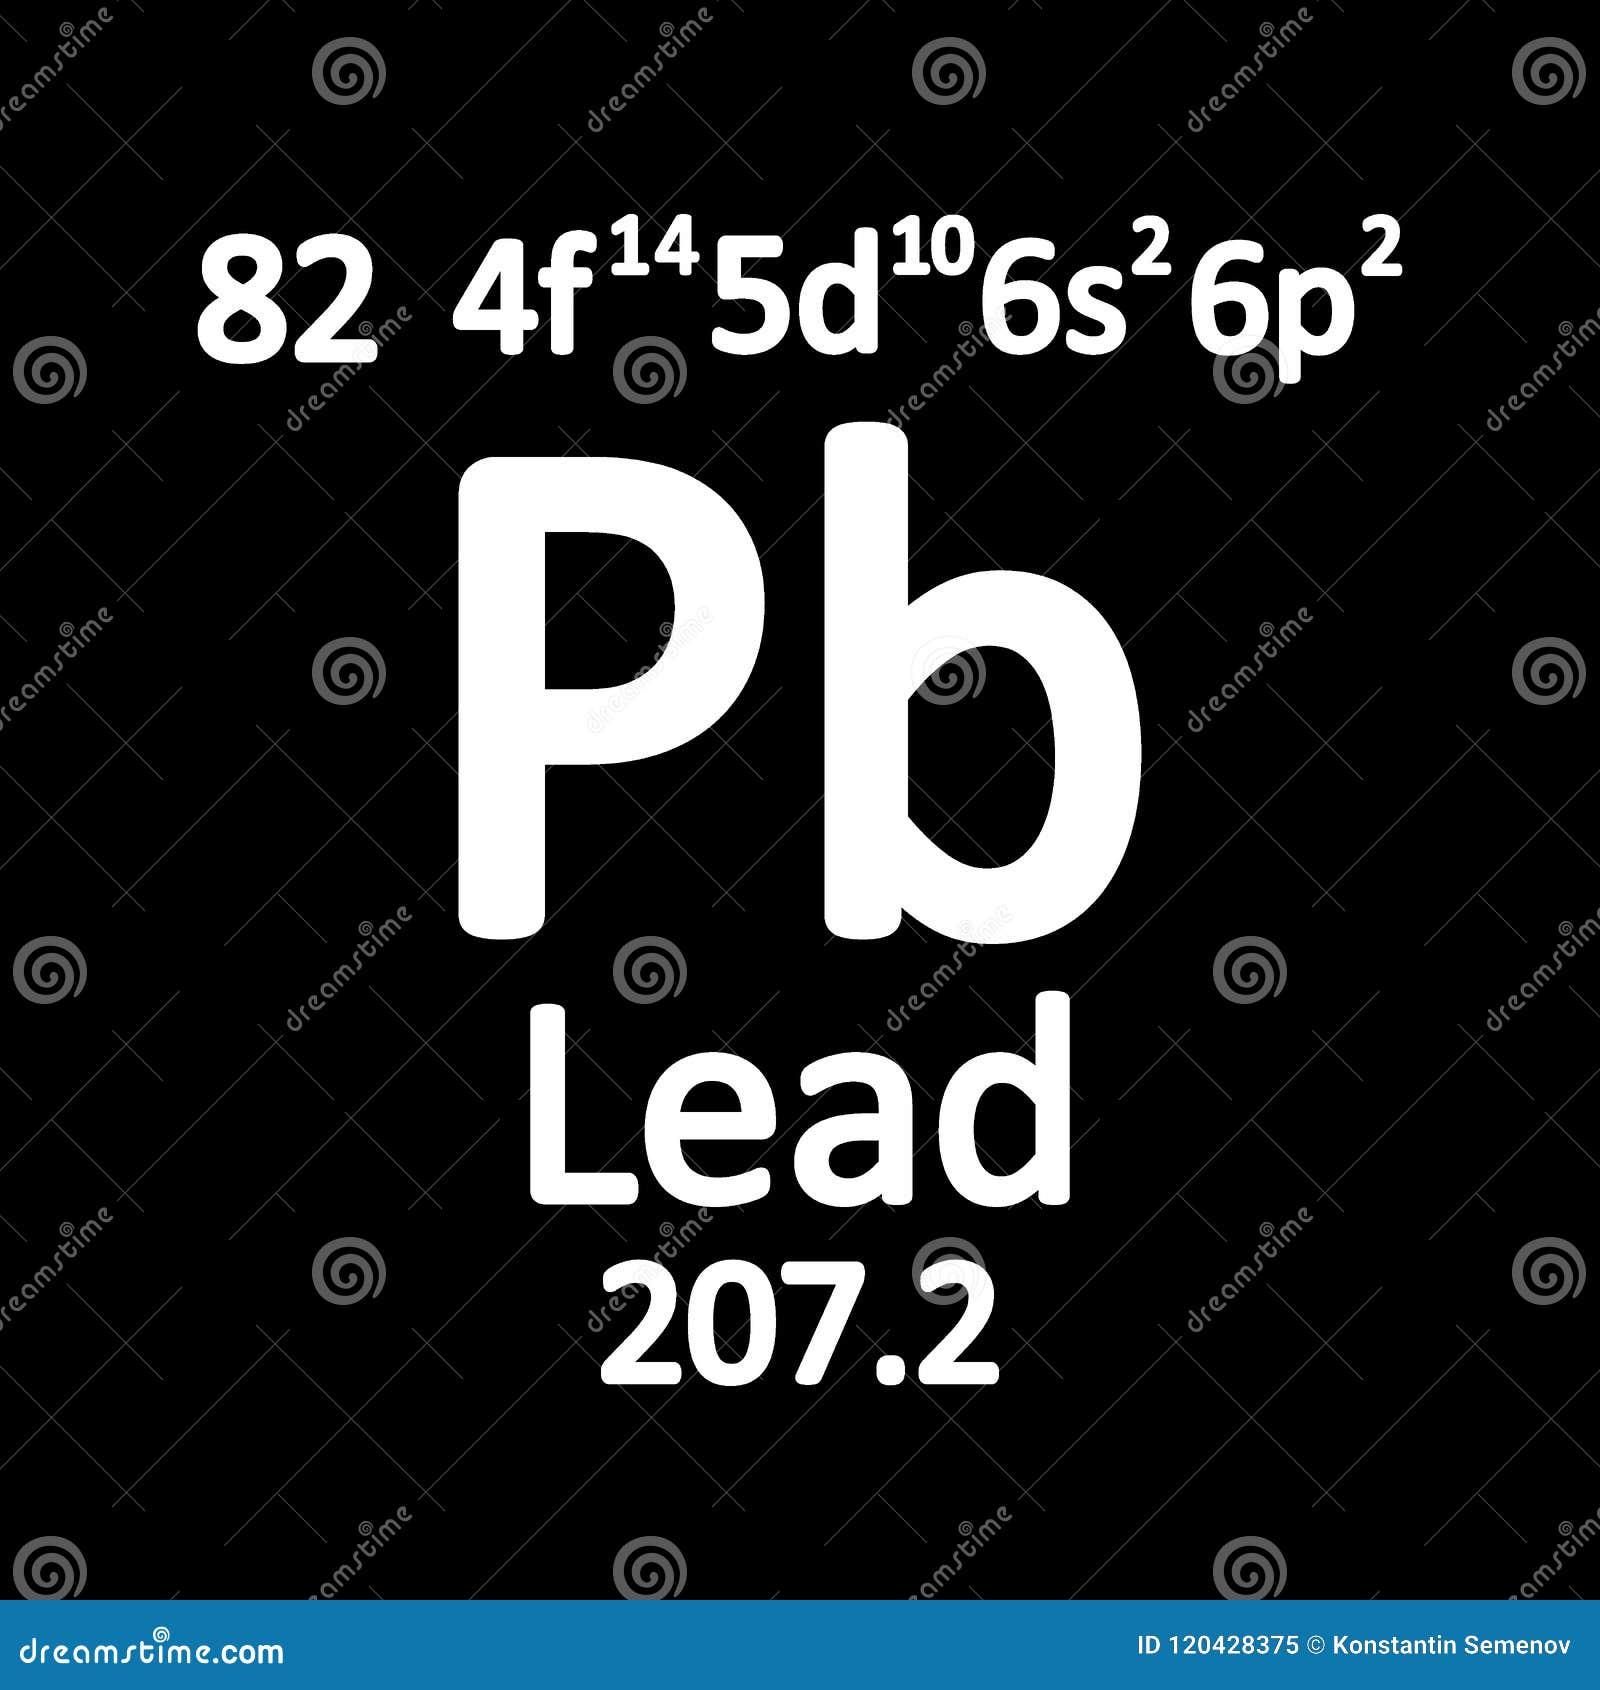 Periodic Table Element Lead Icon Stock Illustration Illustration